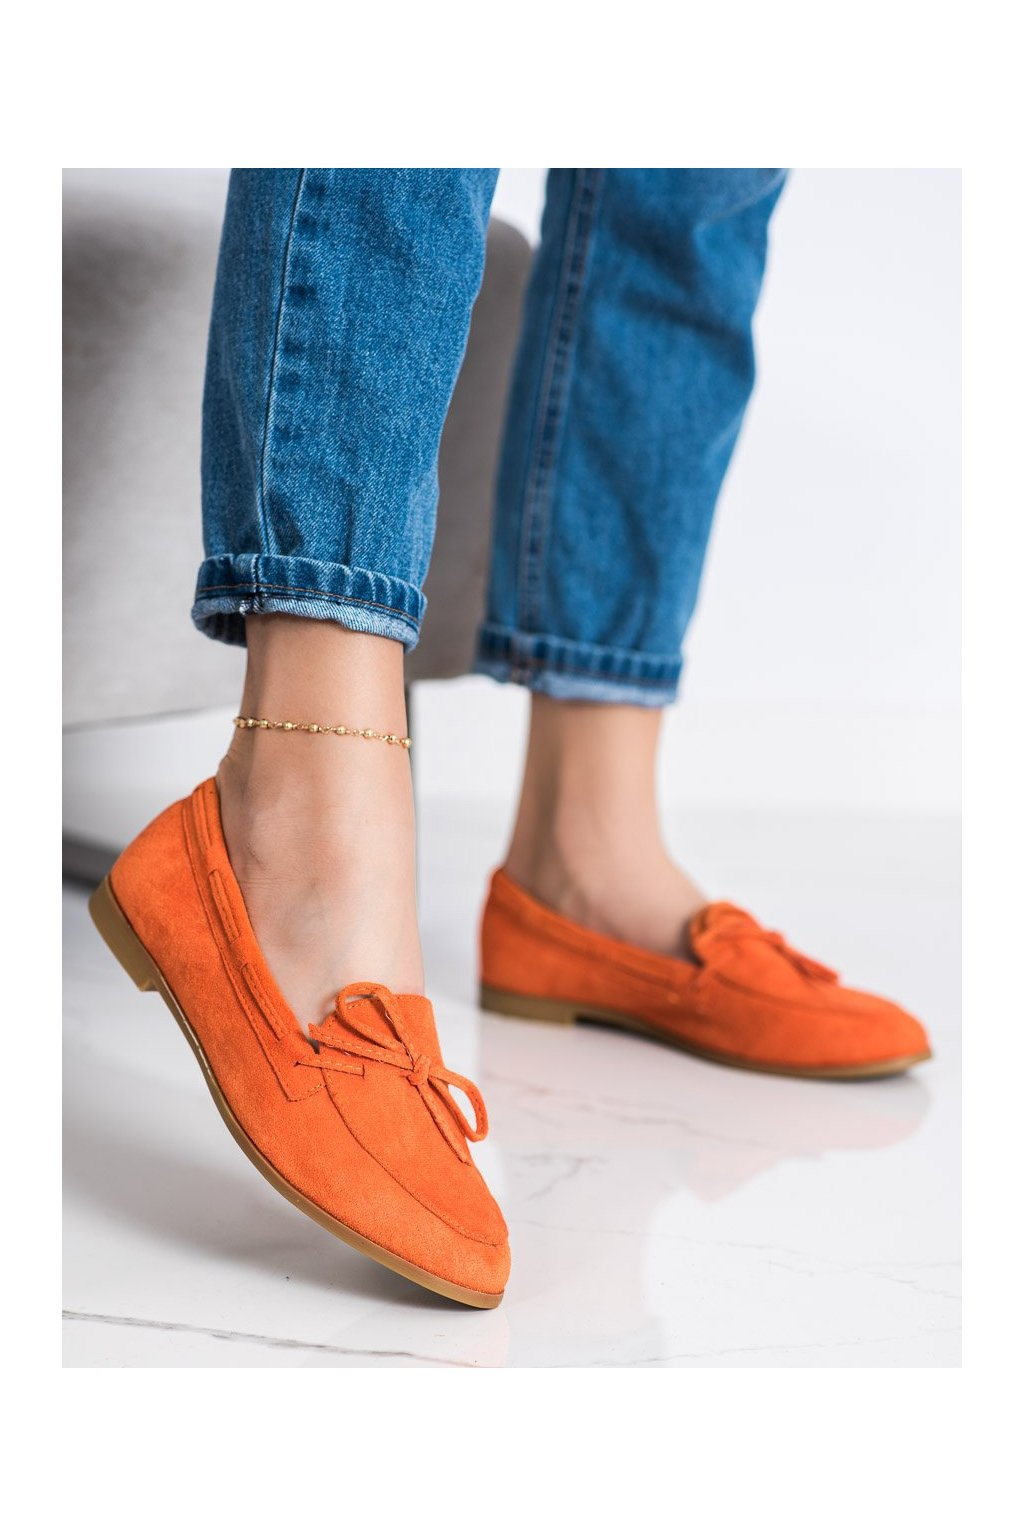 Oranžové mokasíny Coura kod 3394OR